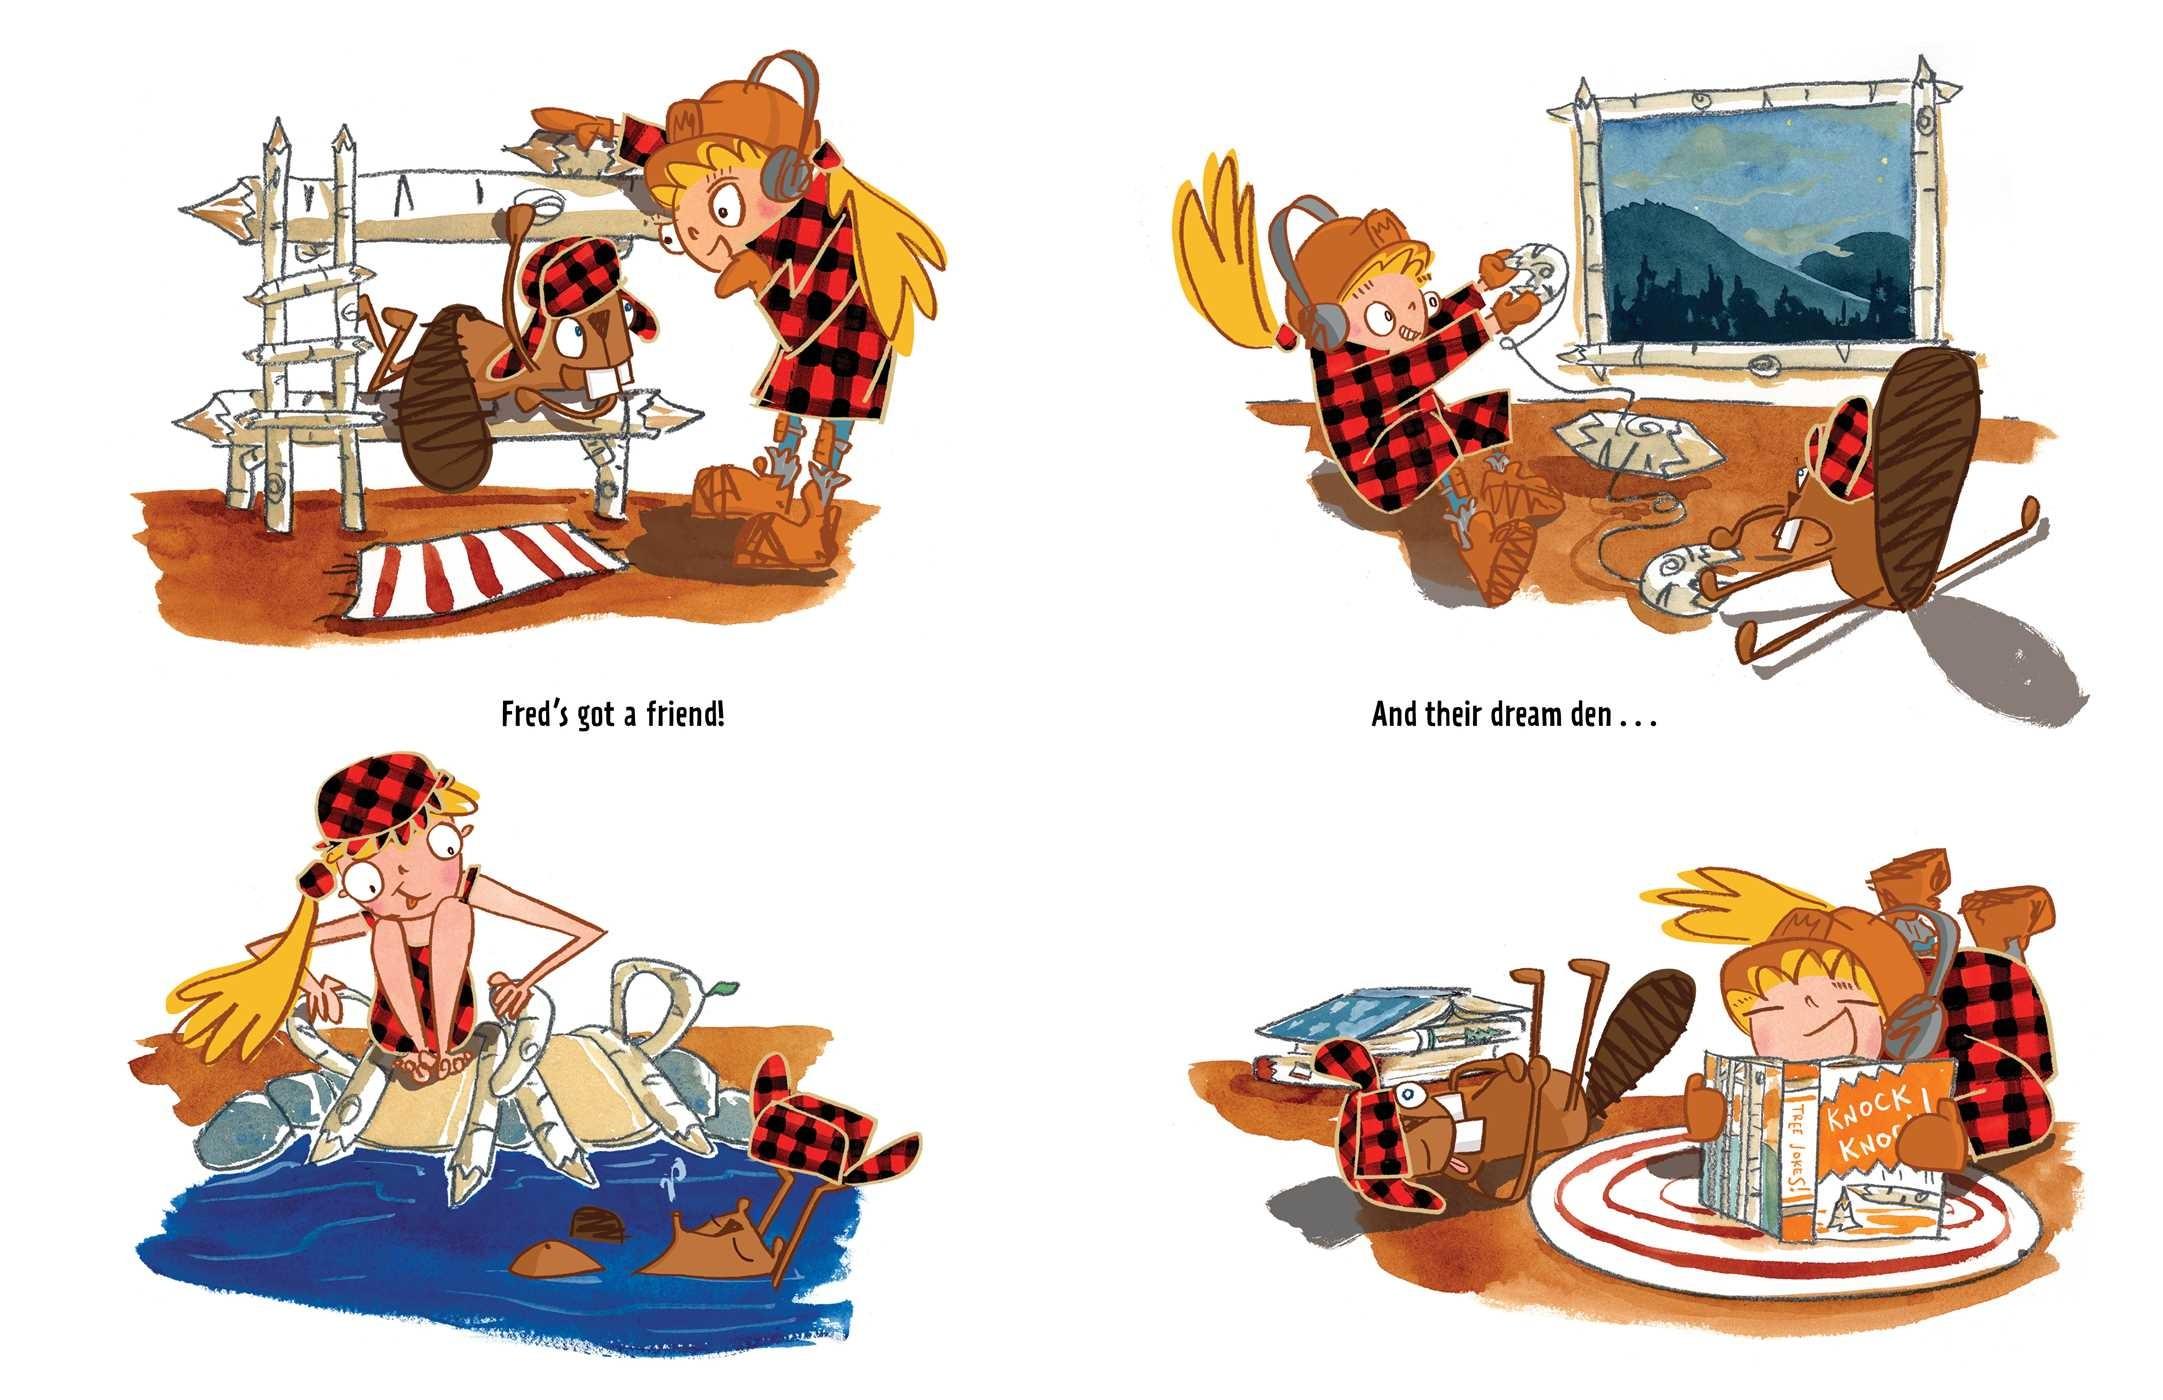 Fred the lumberjack 9781481429832.in05